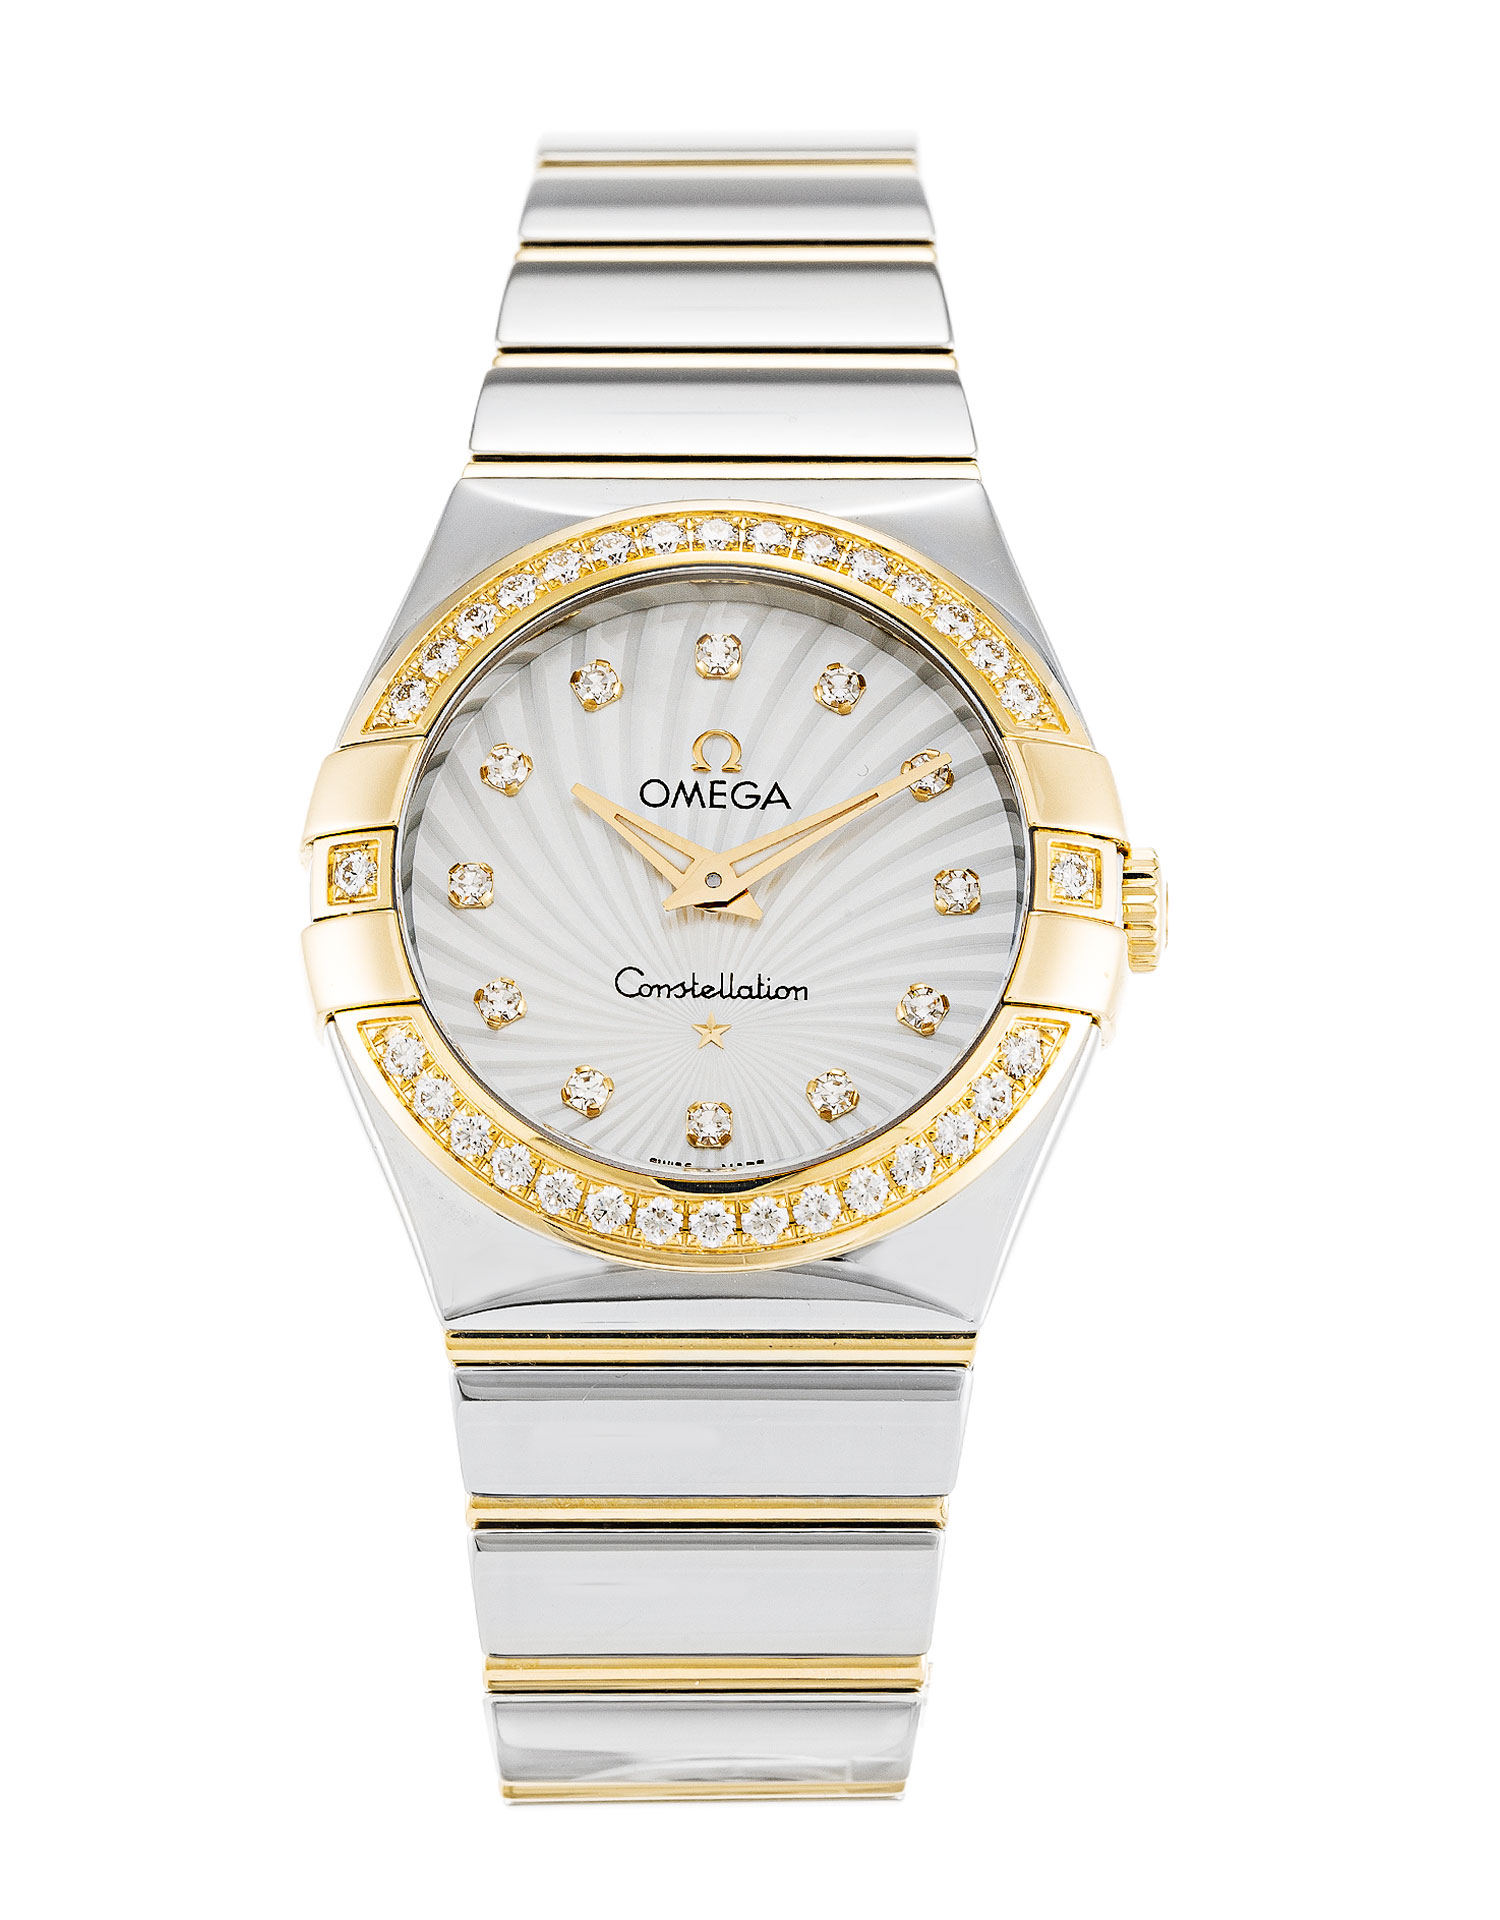 Omega Constellation Ladies 123.25.27.60.55.008 Ladies 27 Mm Steel & Yellow Gold Set With Diamonds Case Quartz Movement – iapac.to